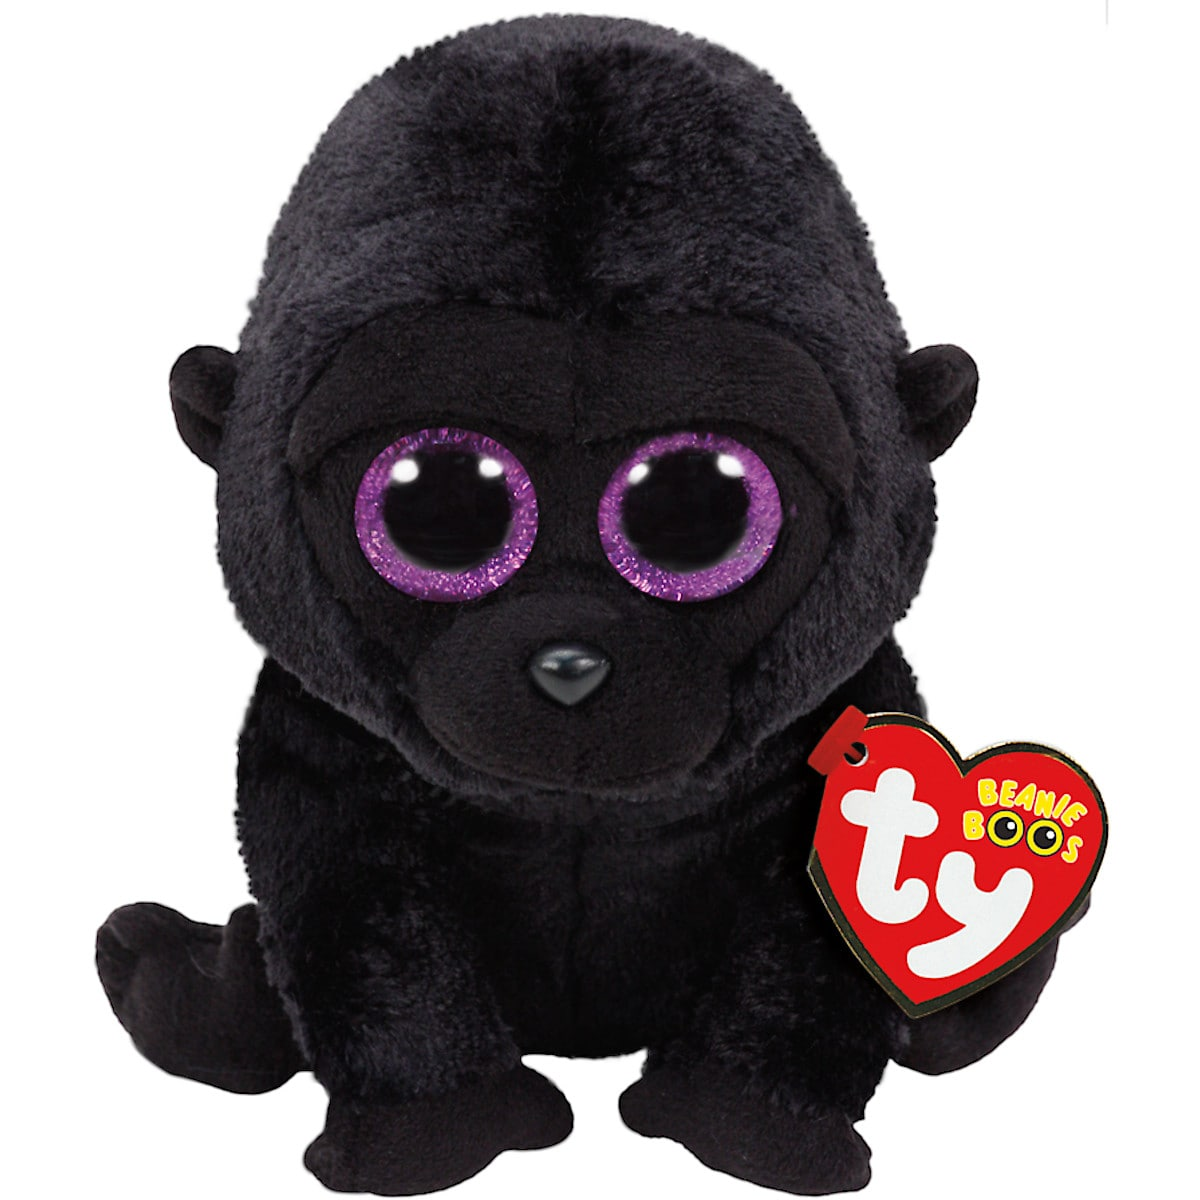 Gosedjur gorillan George, Ty Beanie Boos